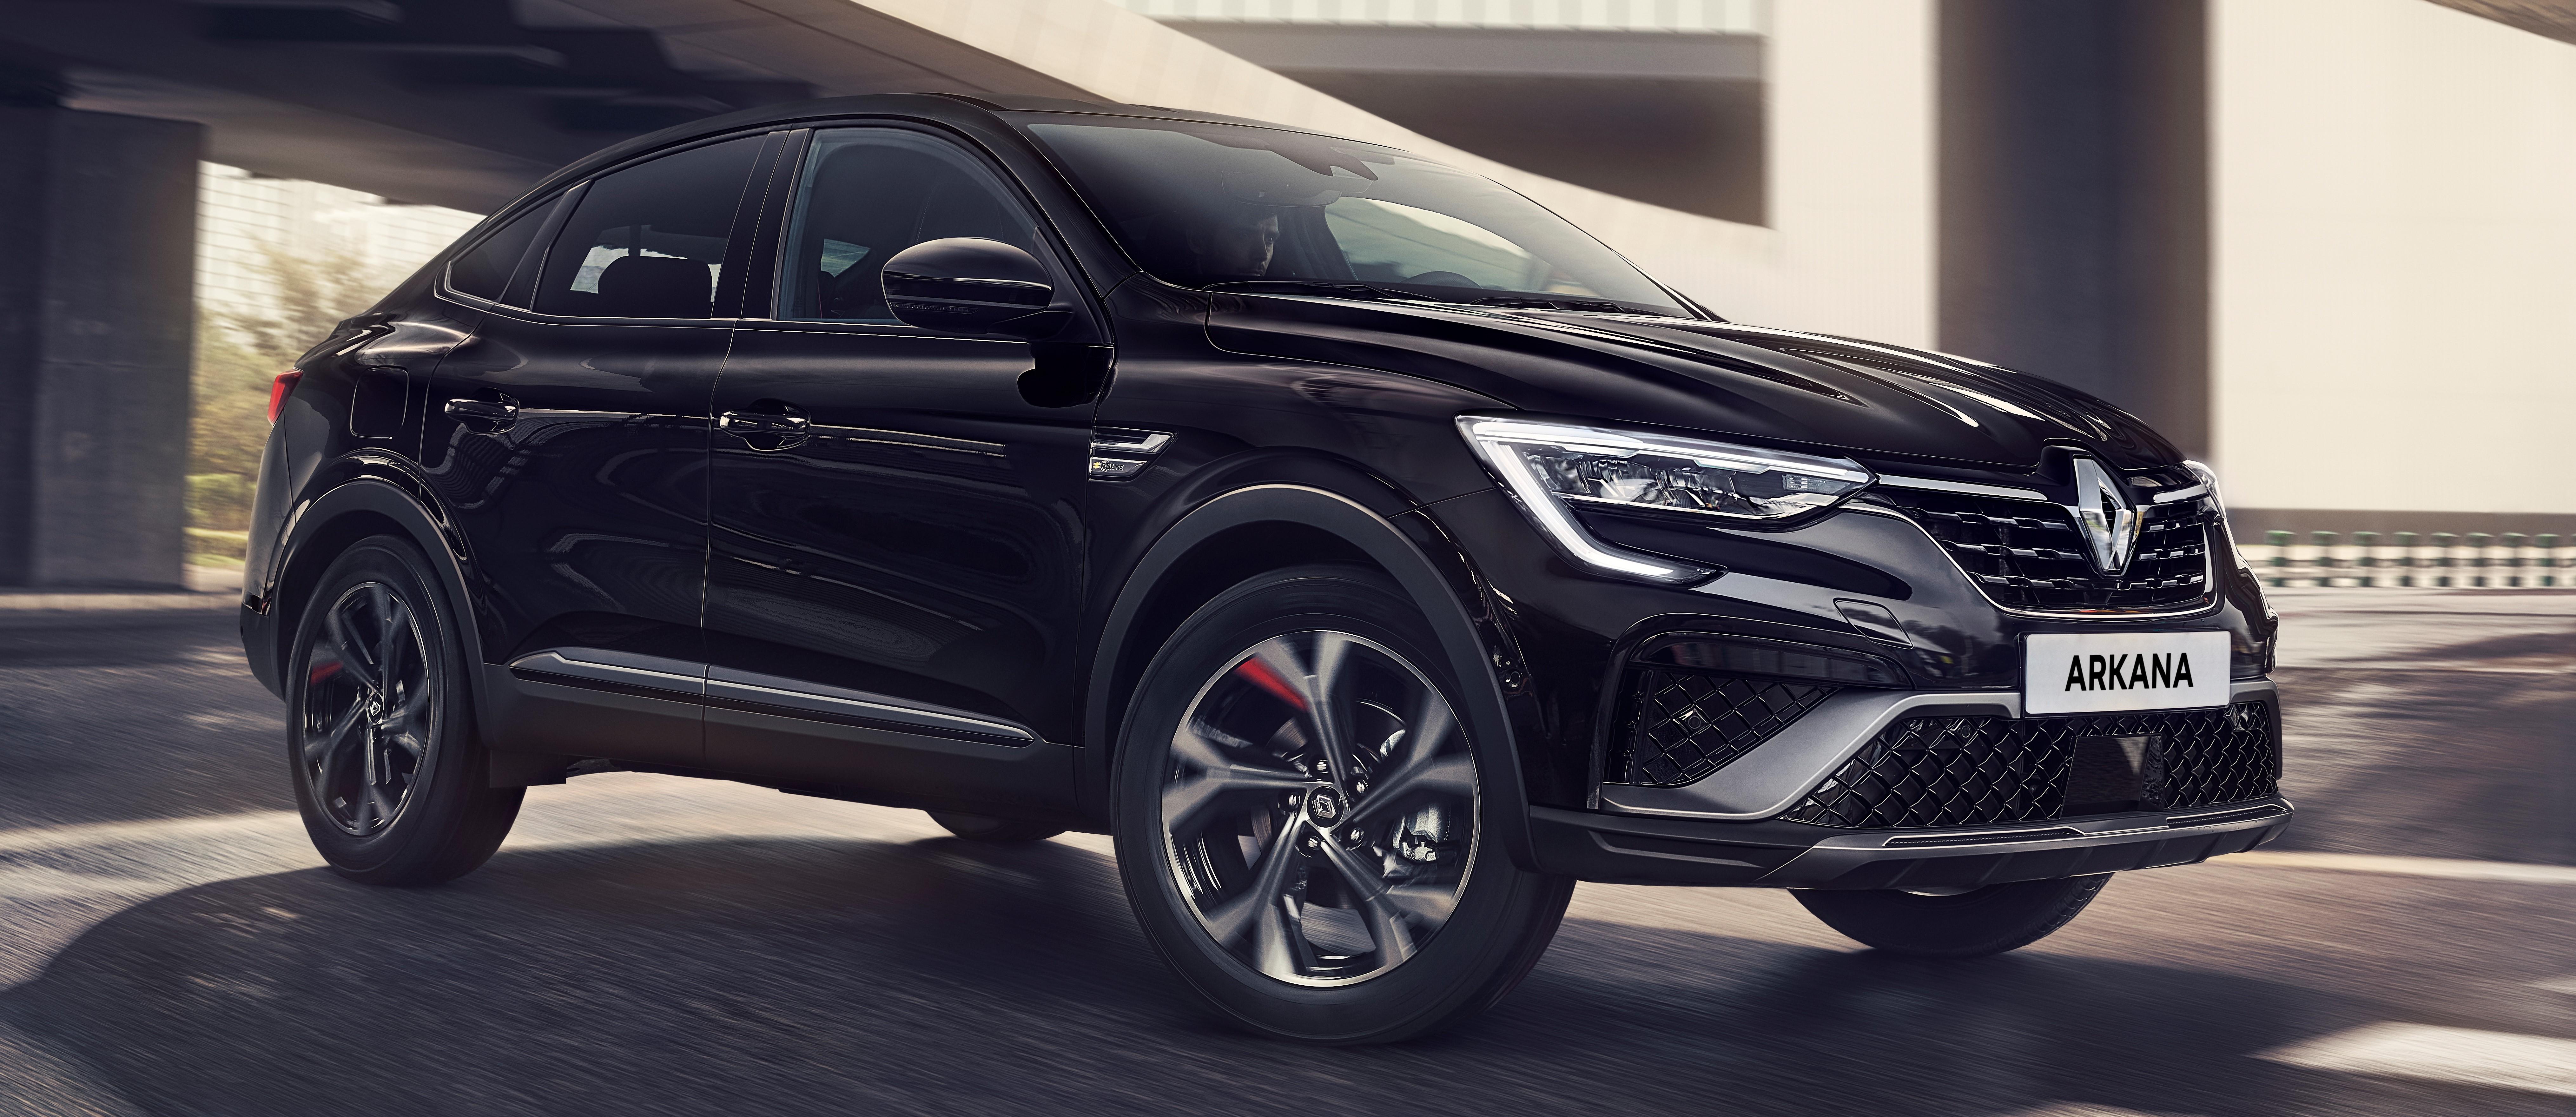 All-new Renault Arkana Hybrid joins line-up